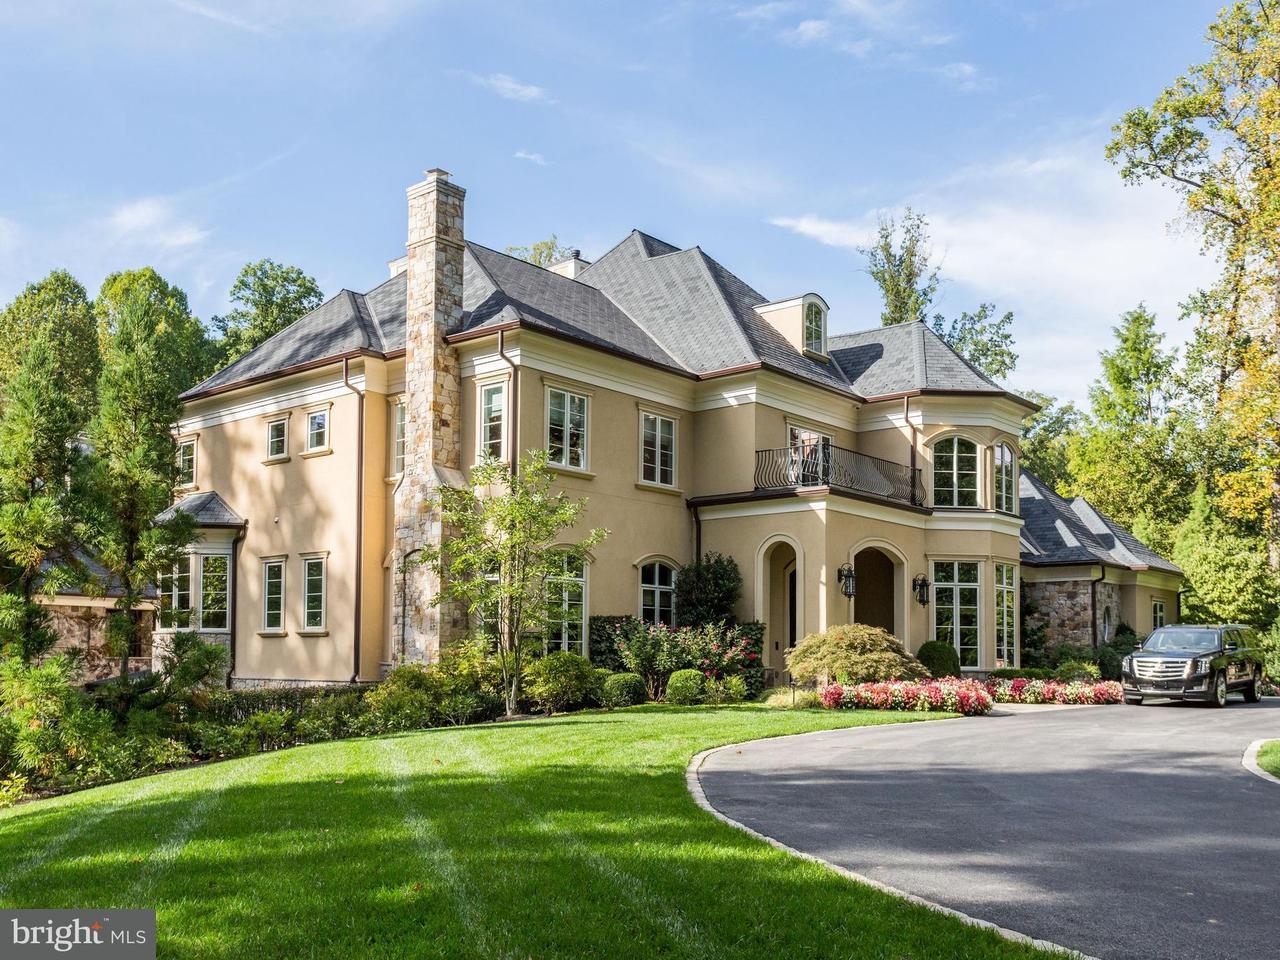 Single Family Home for Sale at 9000 Burning Tree Road 9000 Burning Tree Road Bethesda, Maryland 20817 United States